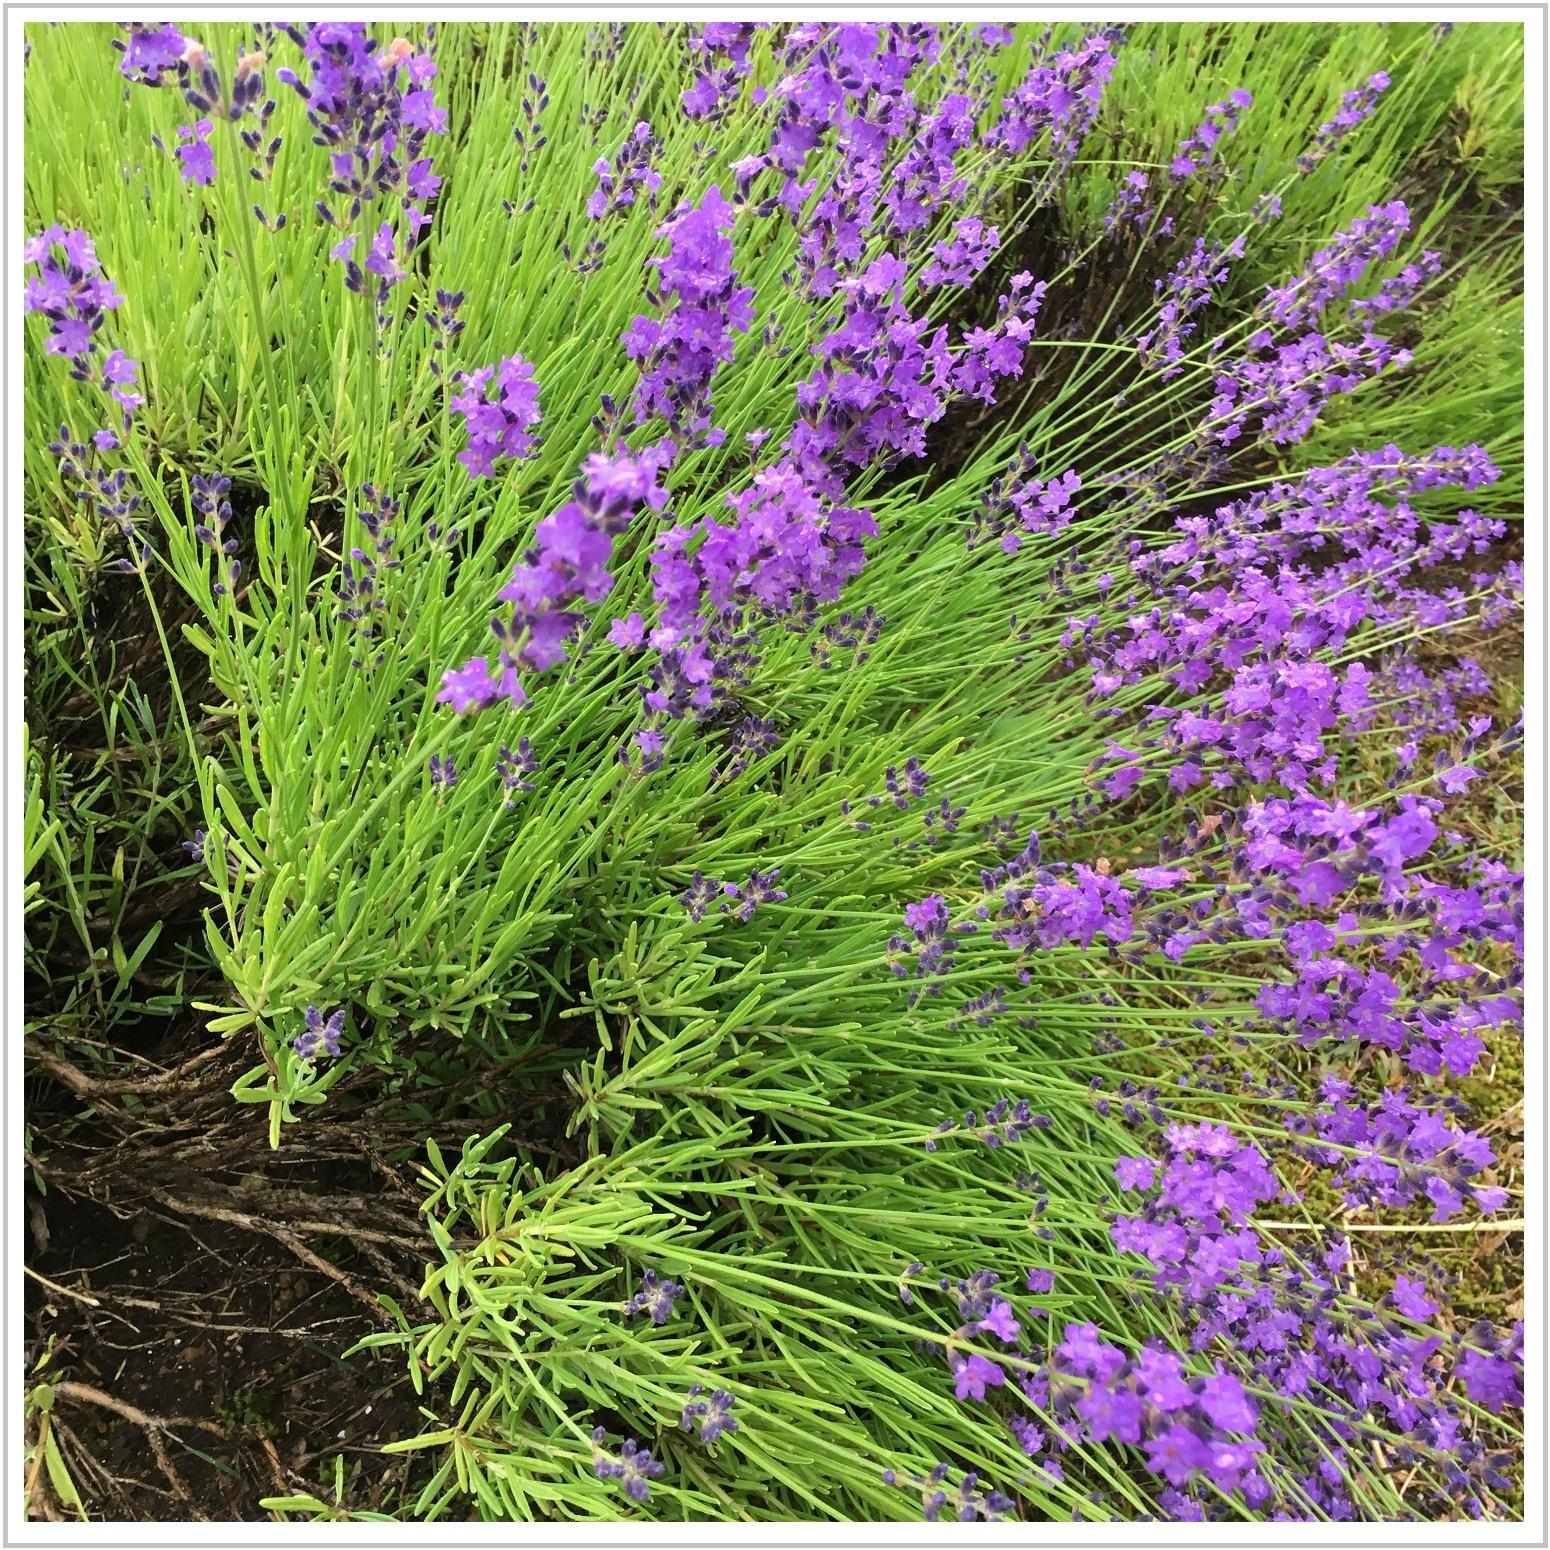 lavender_13_717.jpg